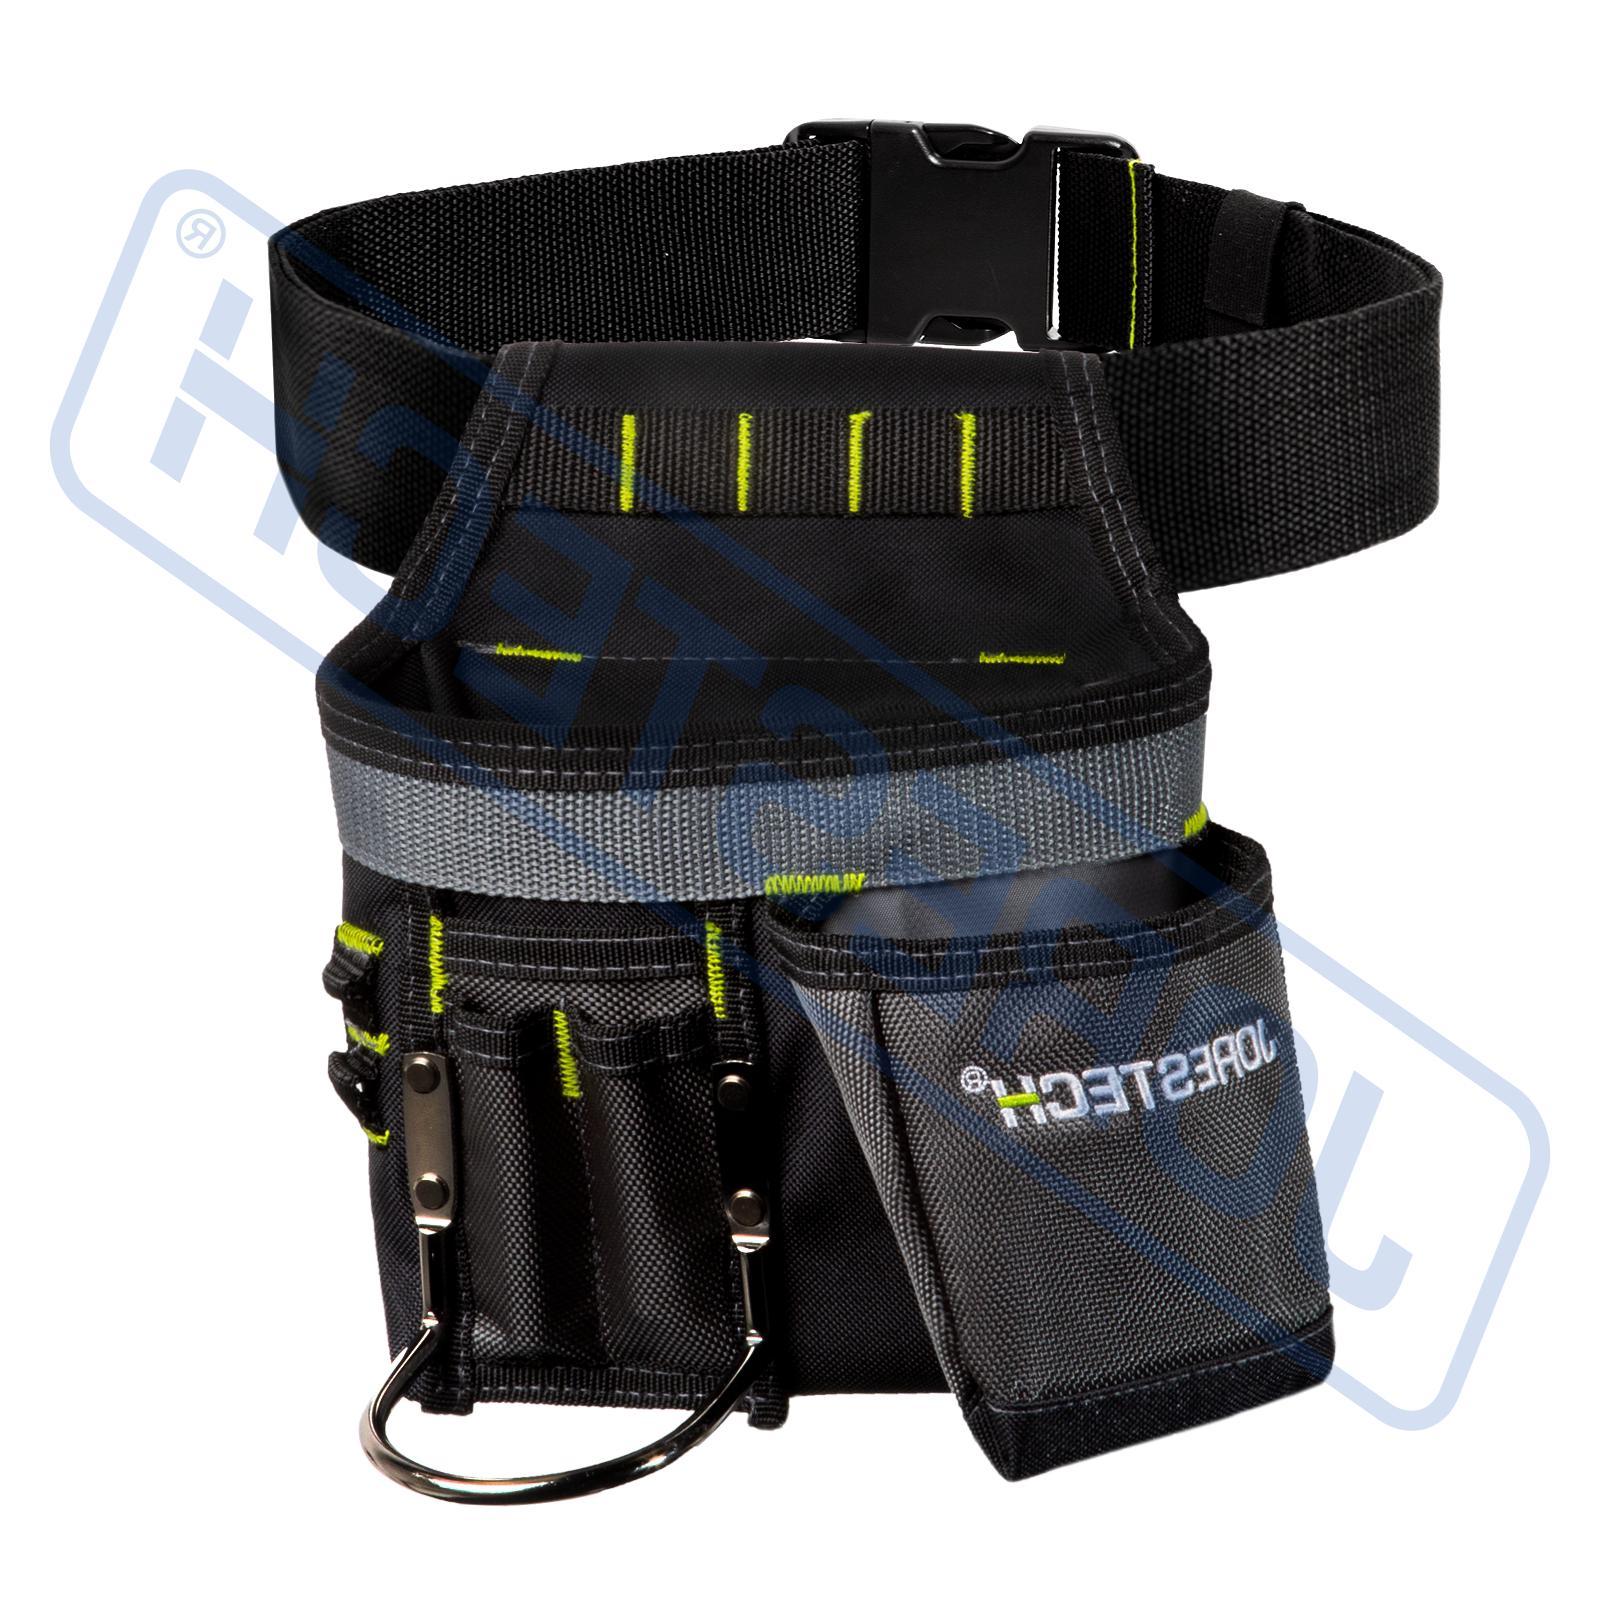 electrician tool bag waist 5 pocket pouch